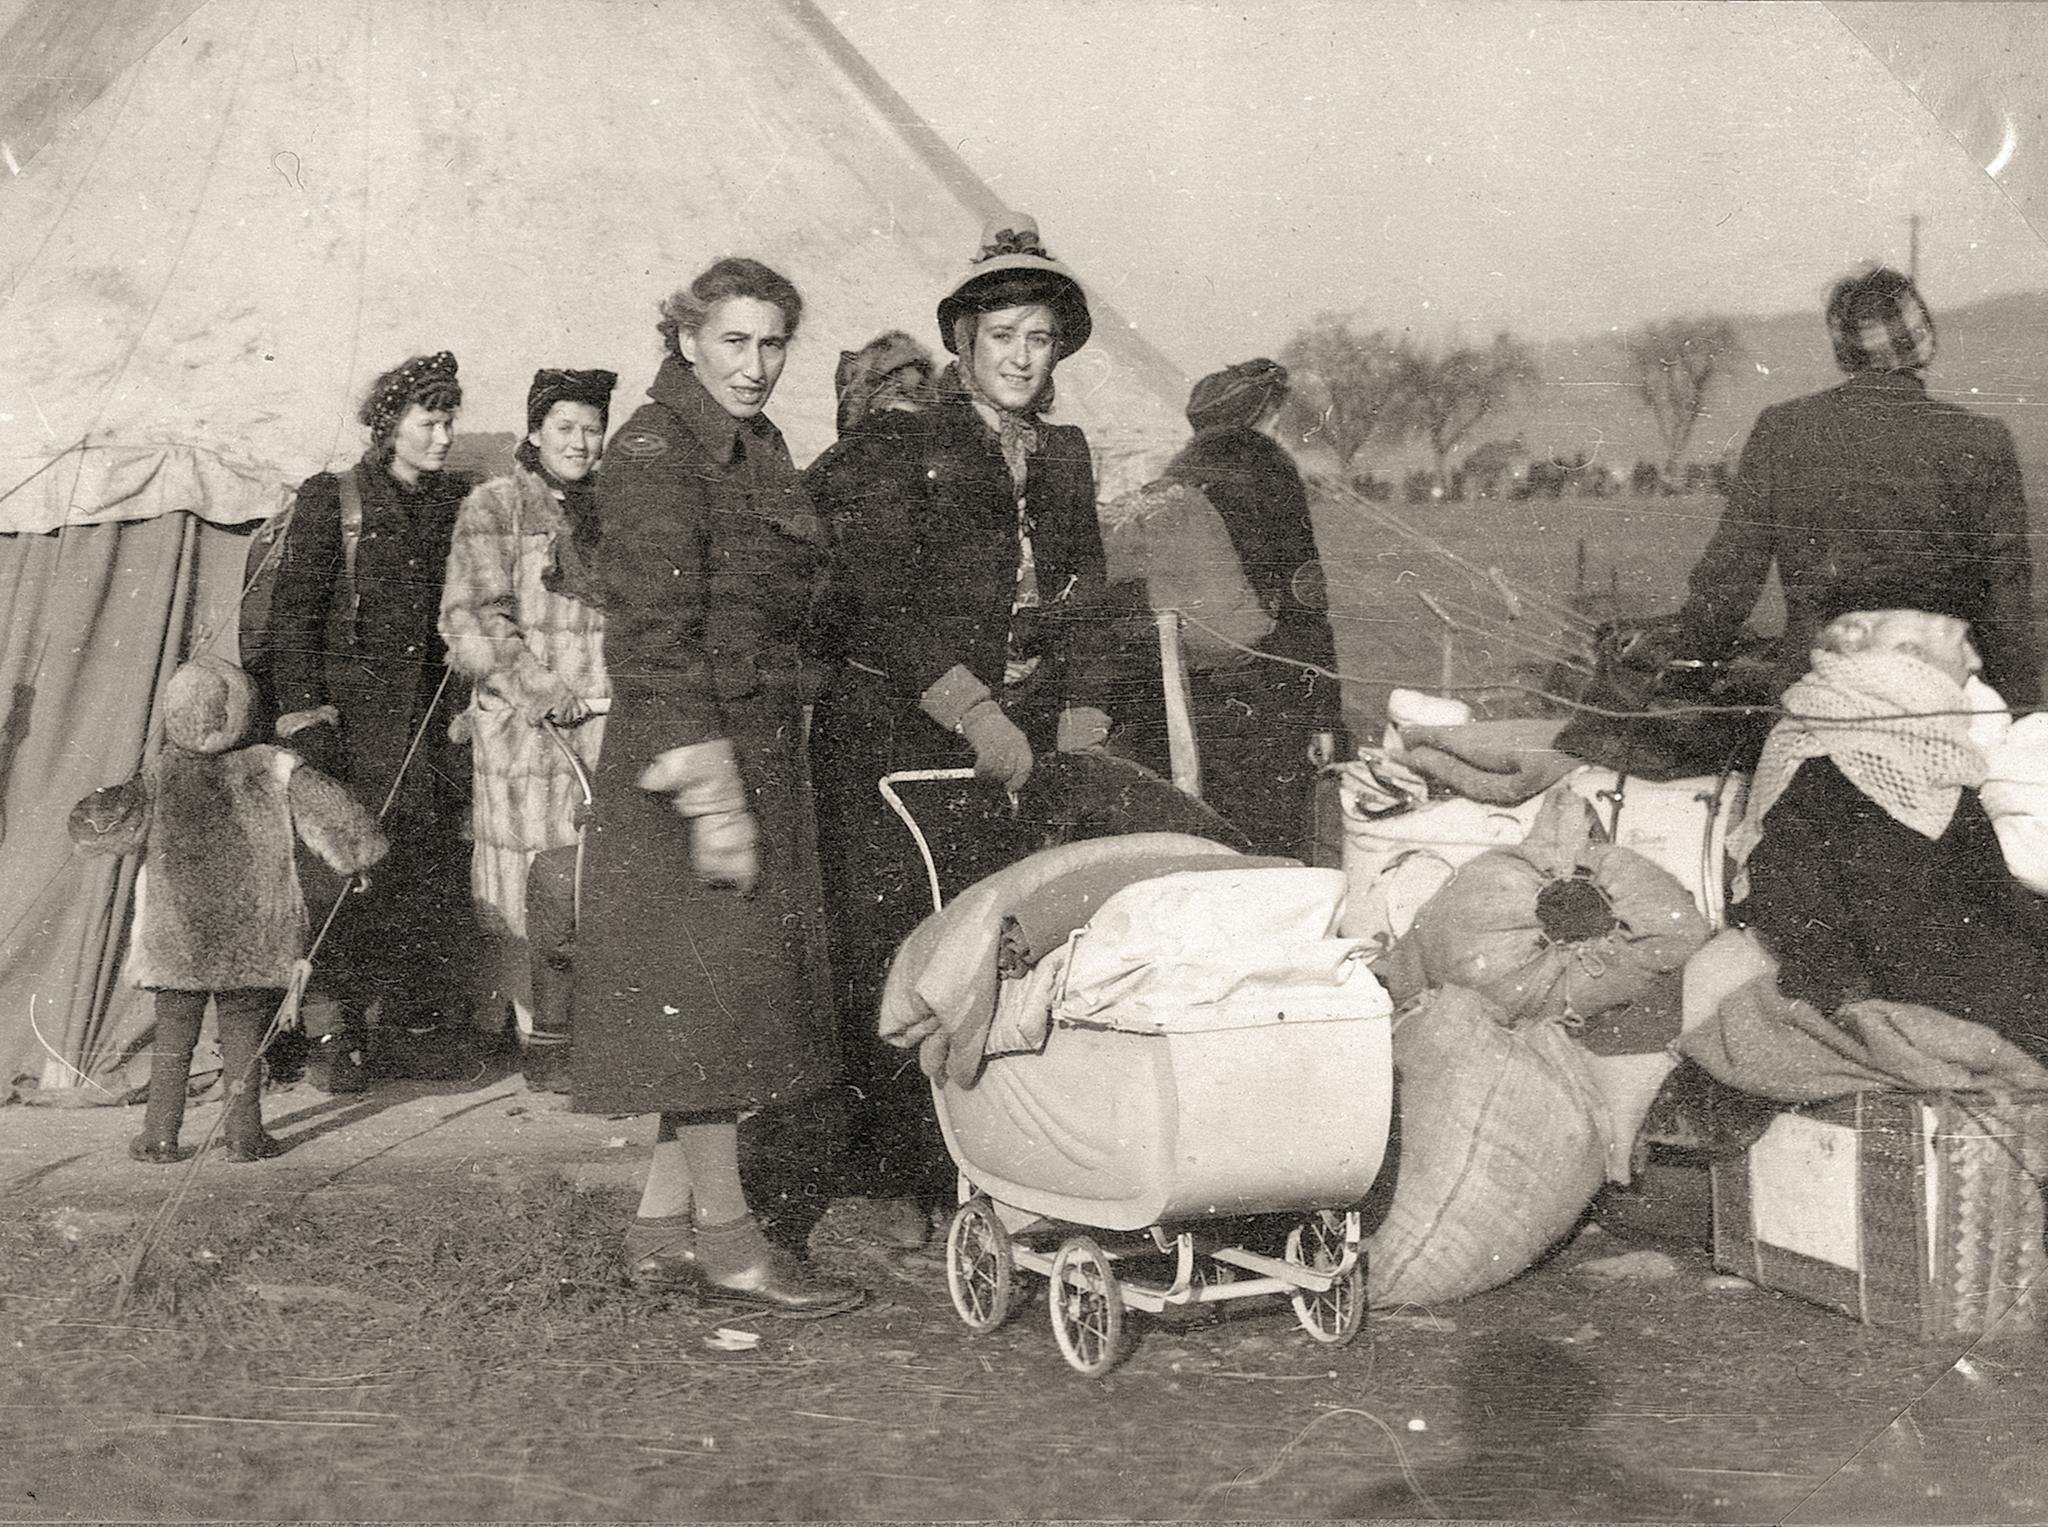 Frieddland 1945